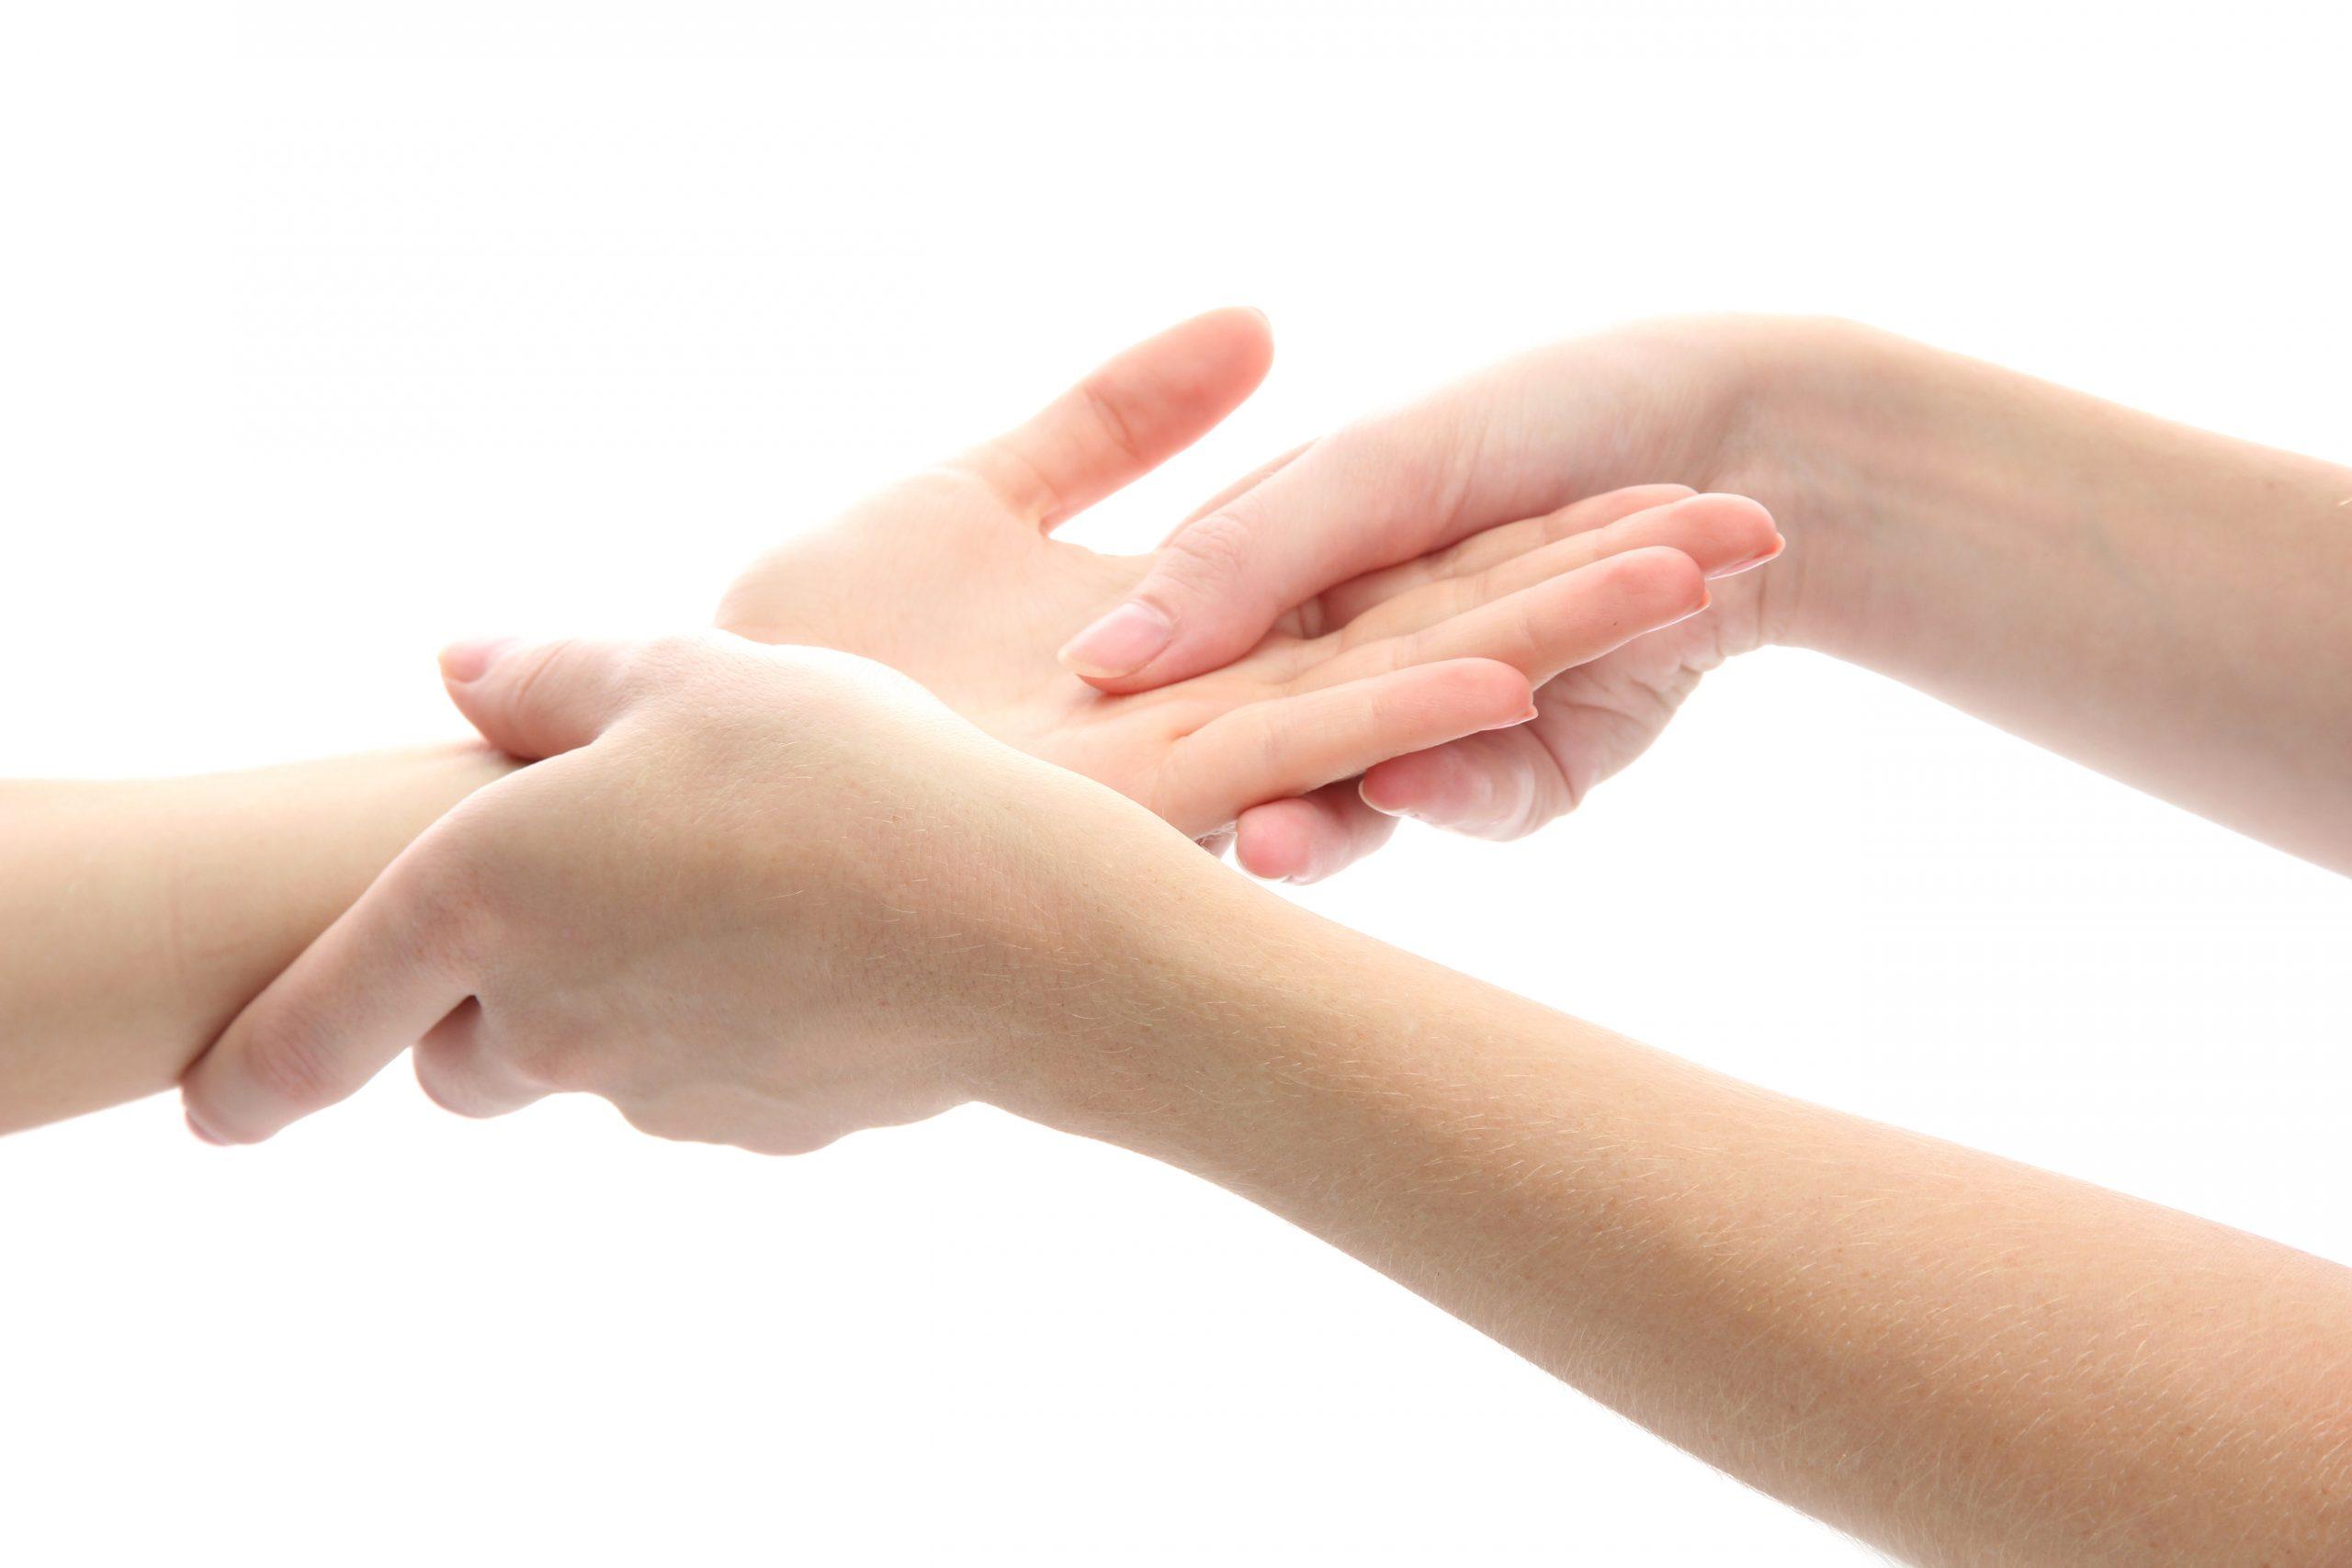 photo mains massage point